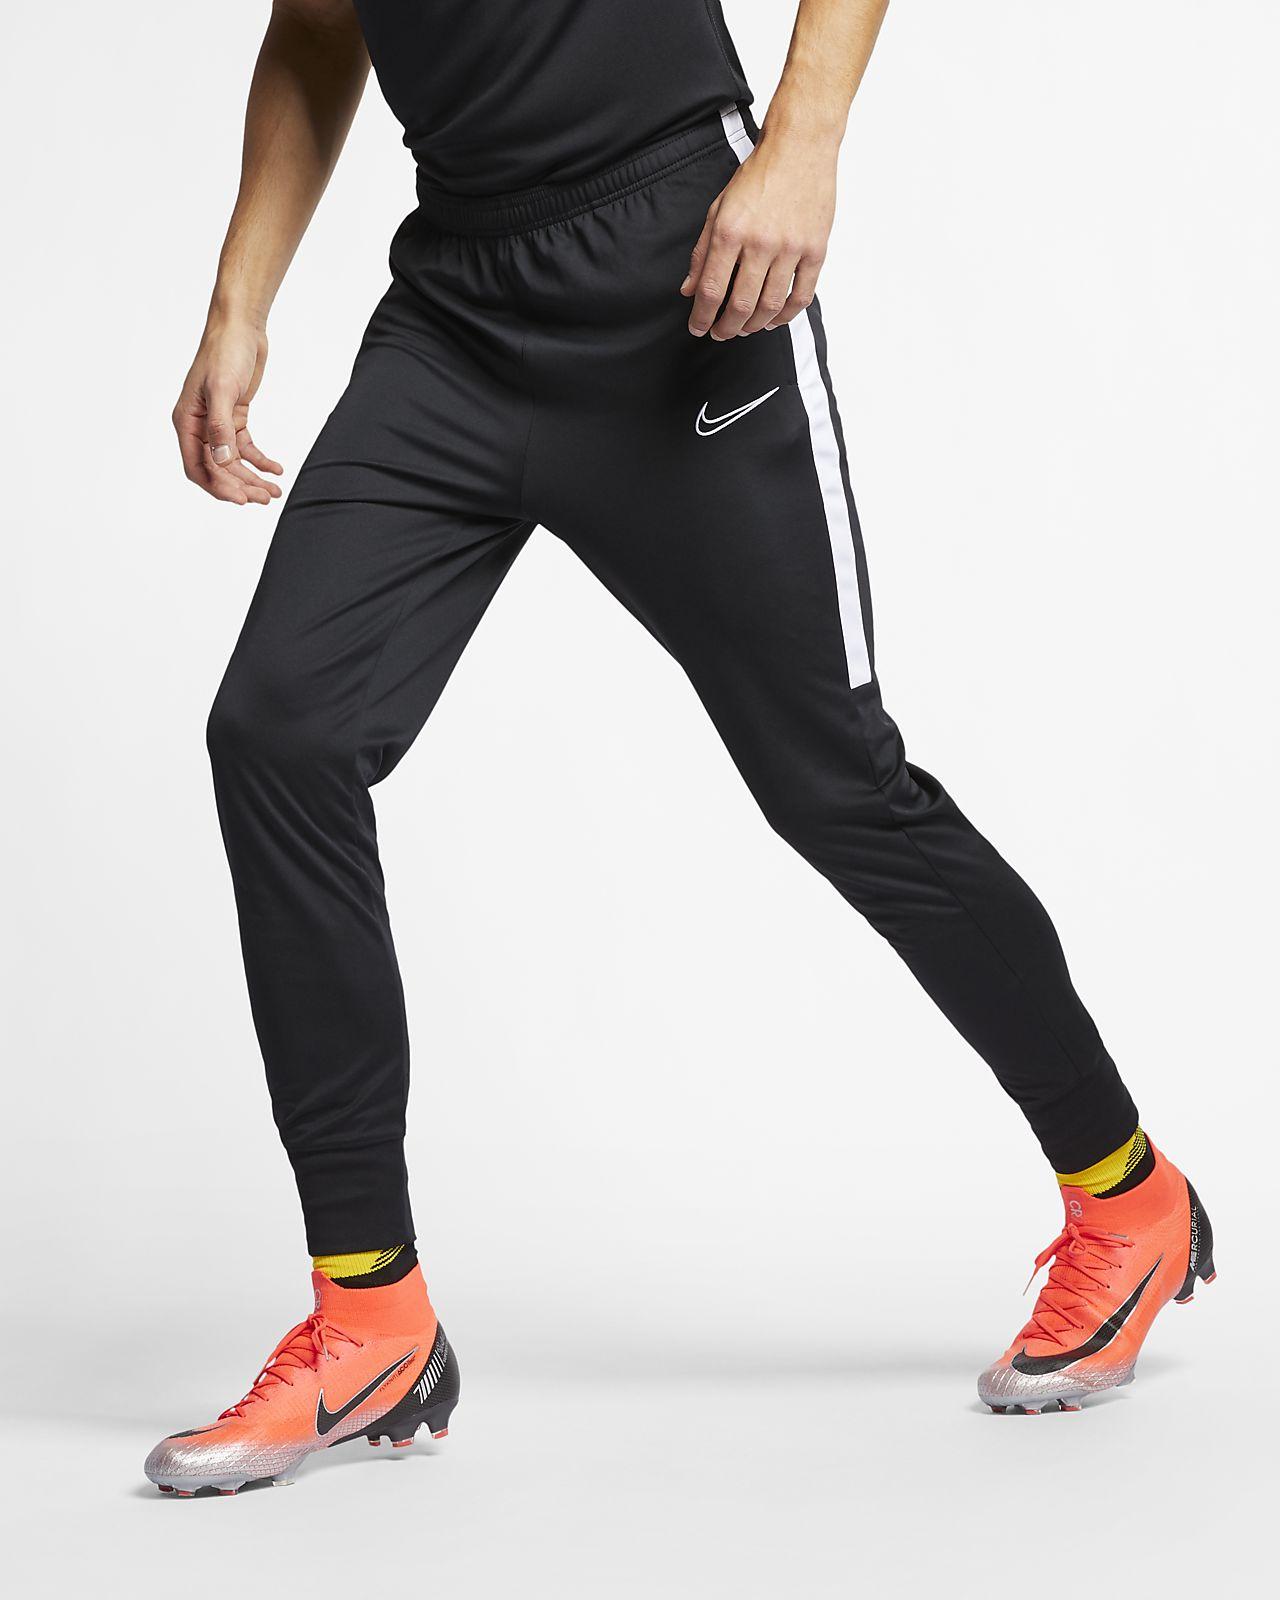 Fútbol Dri De Fit Academy Para Nike Hombre Pantalones q8wvFg